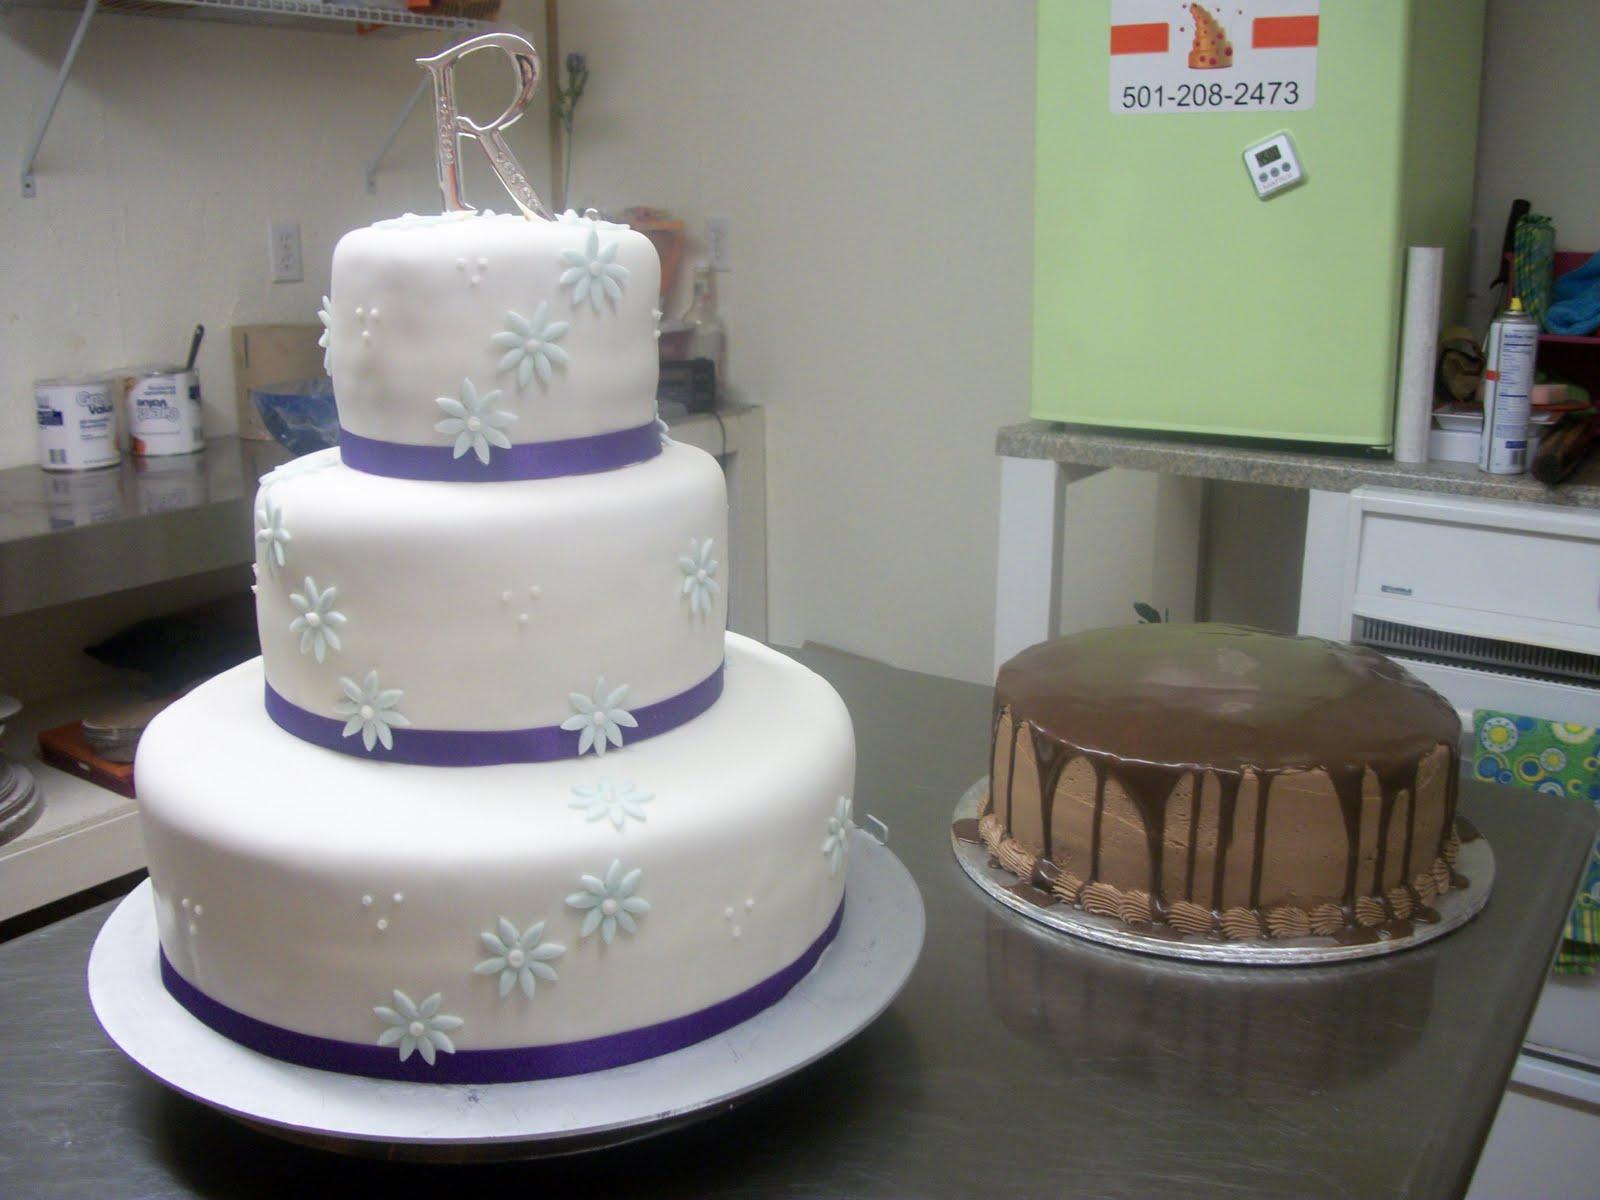 Tasty Cakes Purple & Blue Wedding Cake Chocolate Ganache